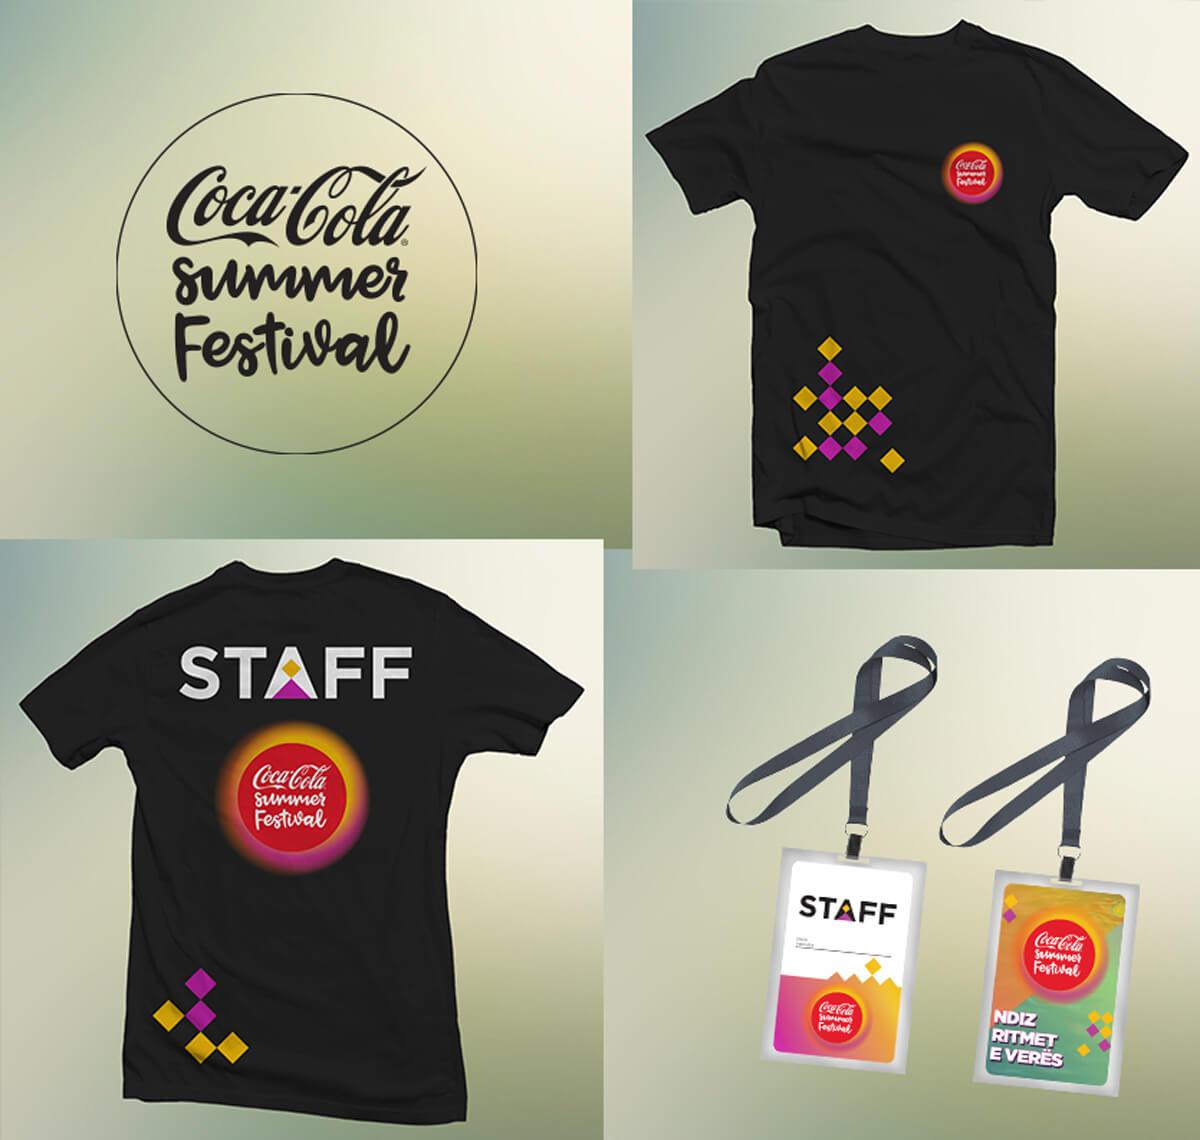 Coca-Cola Summer Fest 2018 branding mockups